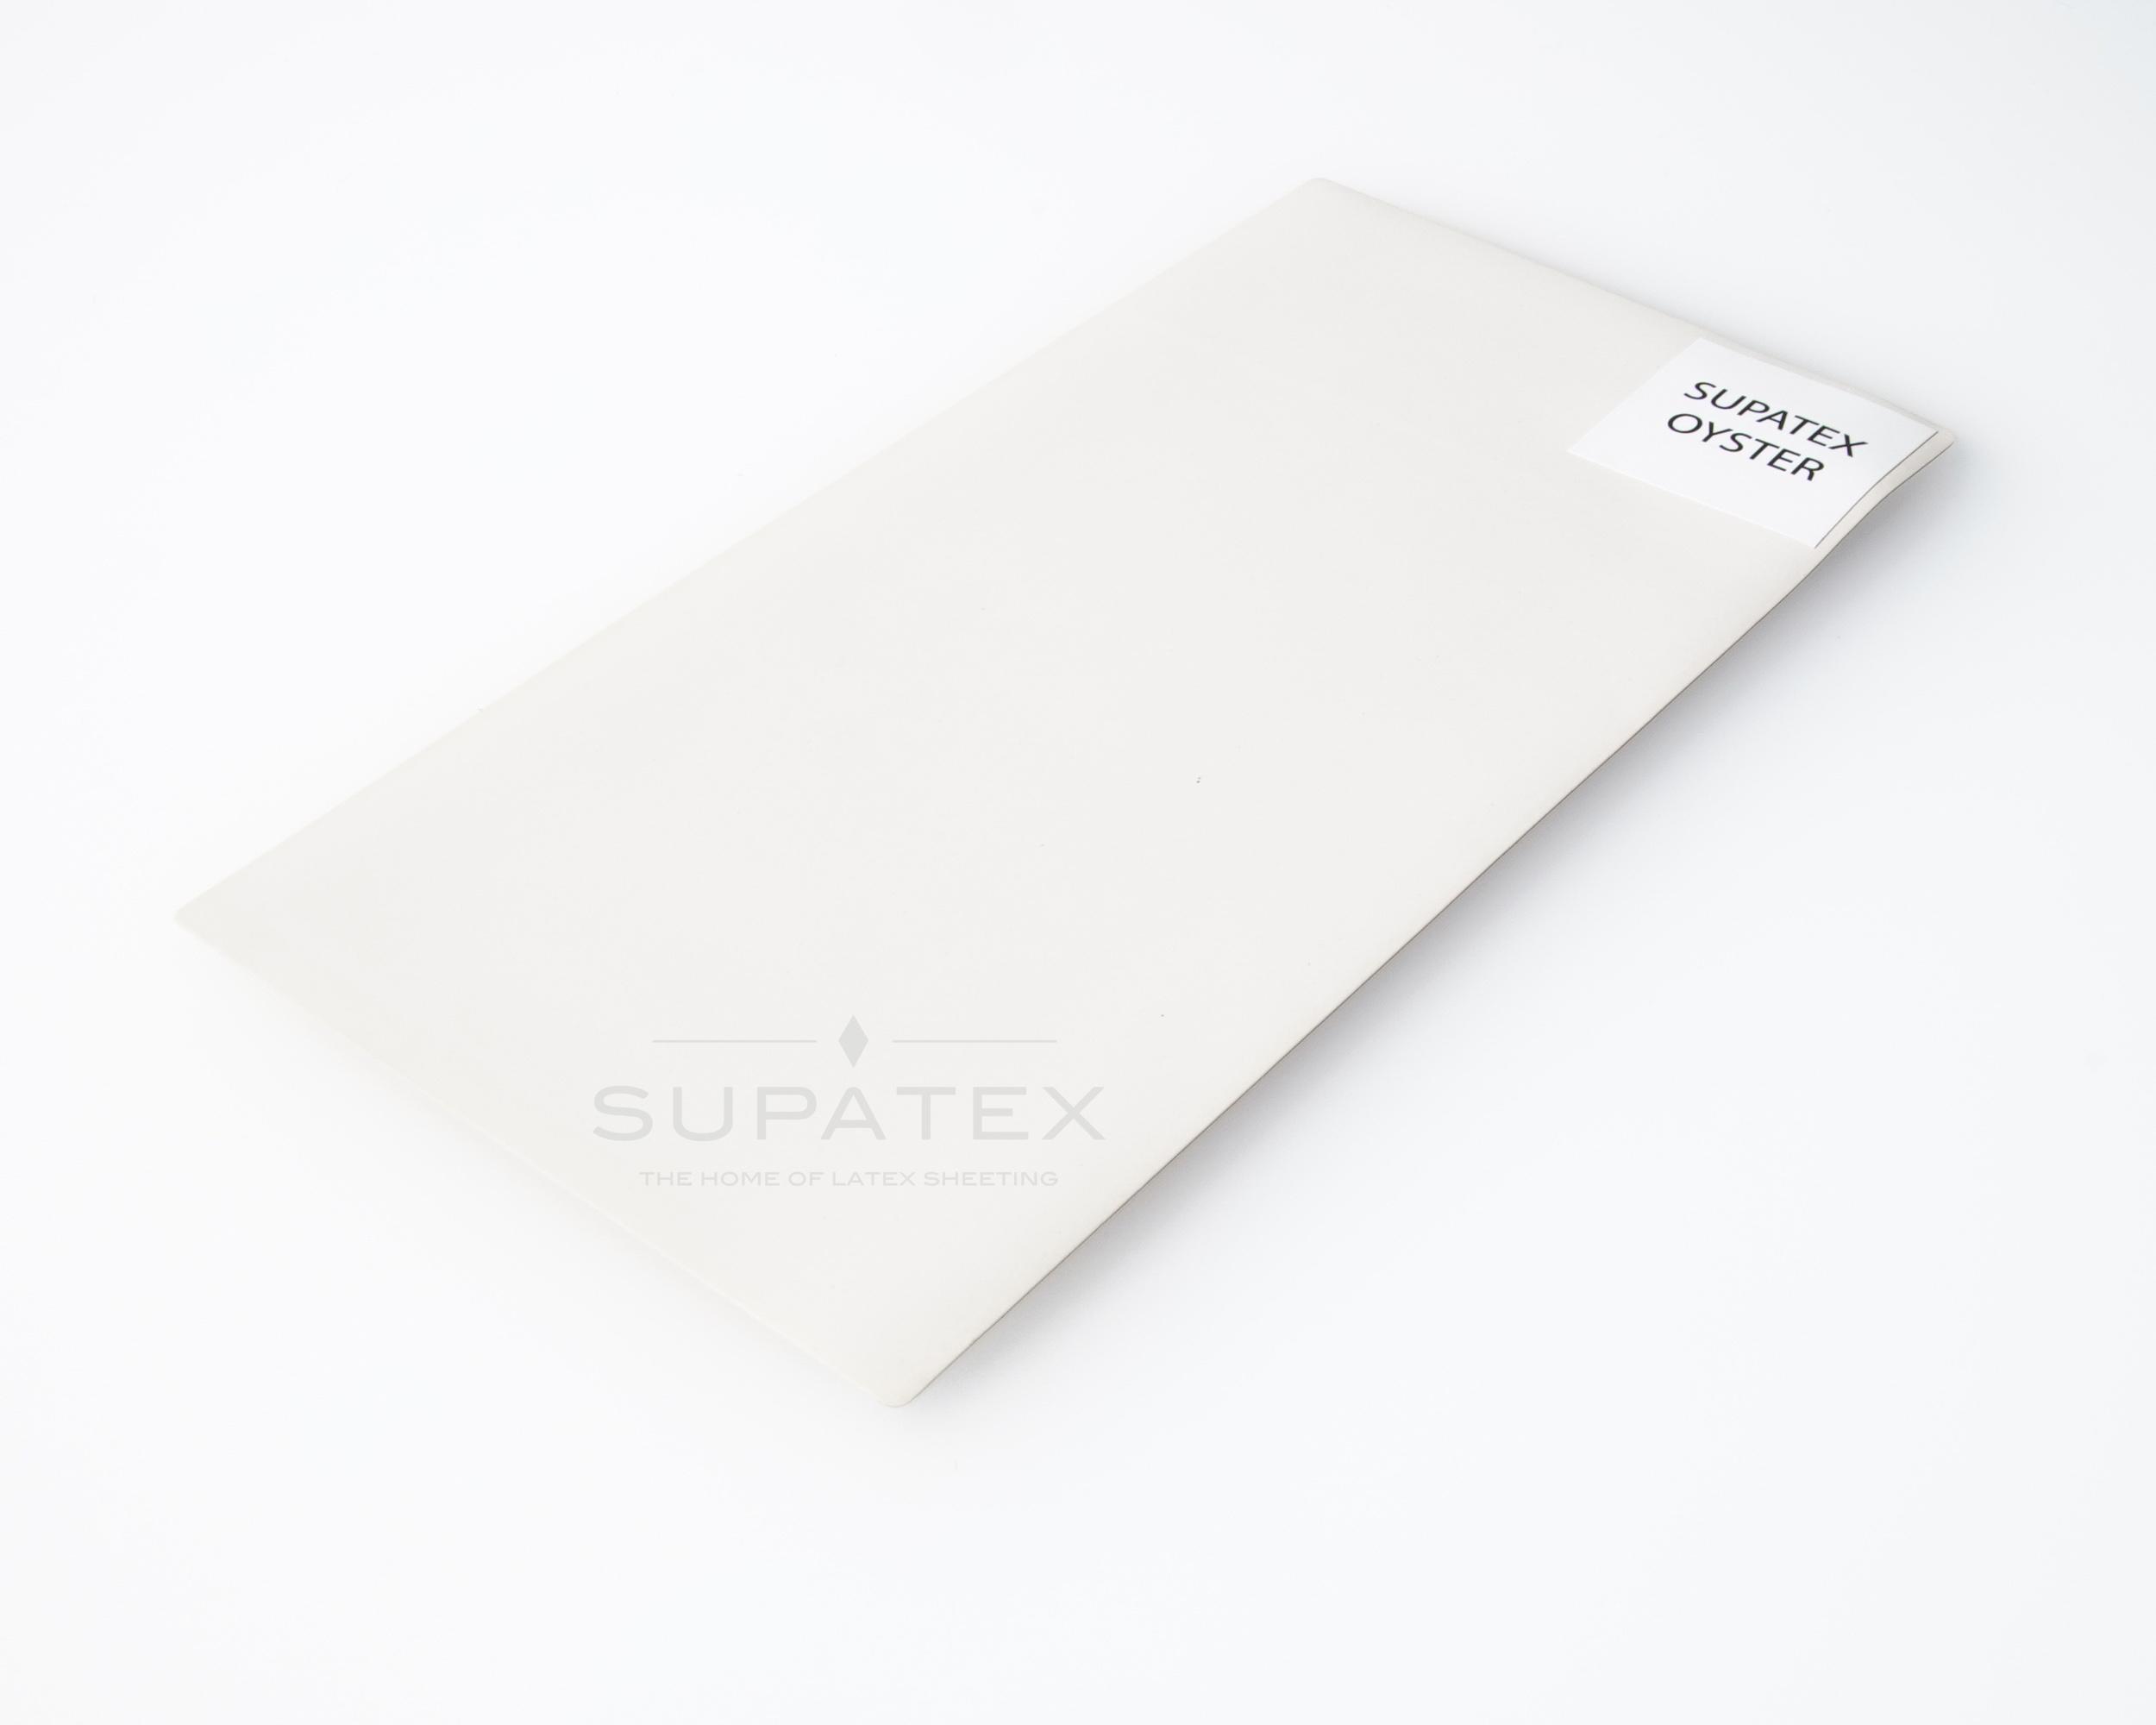 Supatex Oyster White 0.33 mm